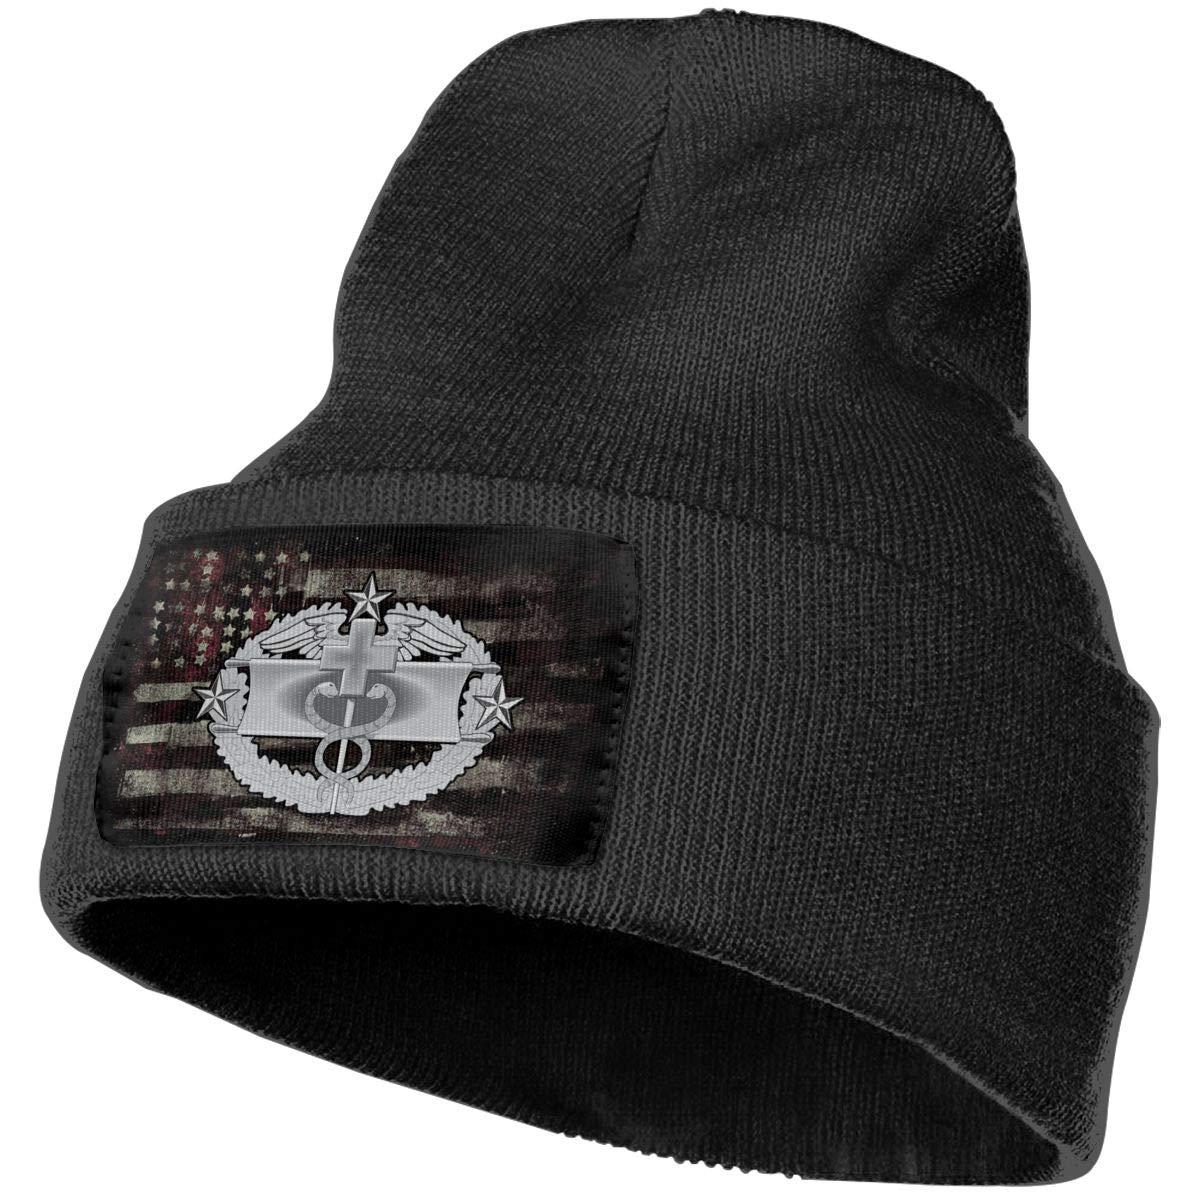 Award License Mens Beanie Cap Skull Cap Winter Warm Knitting Hats. FORDSAN CP Army Combat Medical Fourth 4th